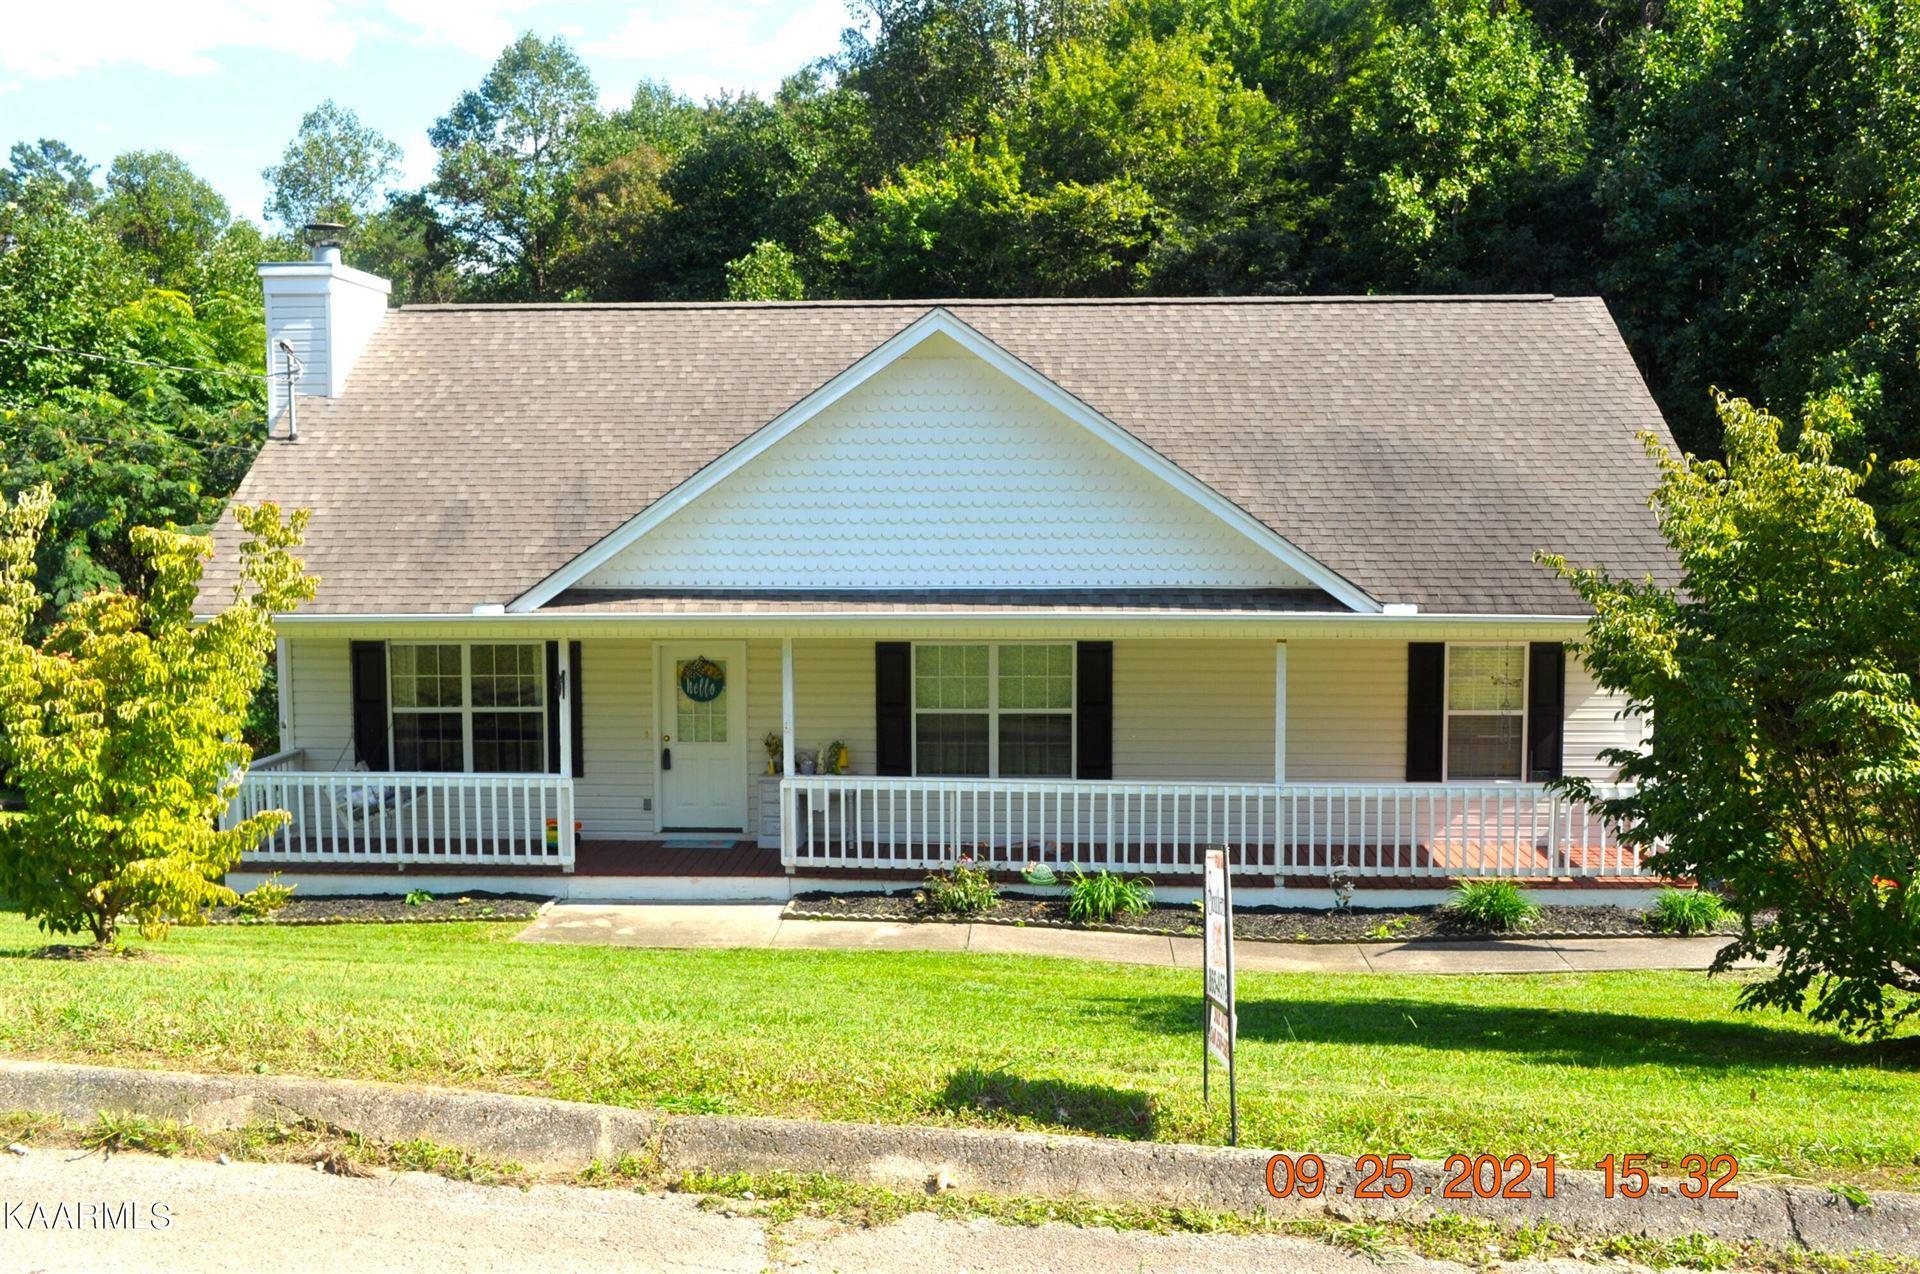 Photo of 212 Gladwood Rd, Clinton, TN 37716 (MLS # 1166333)